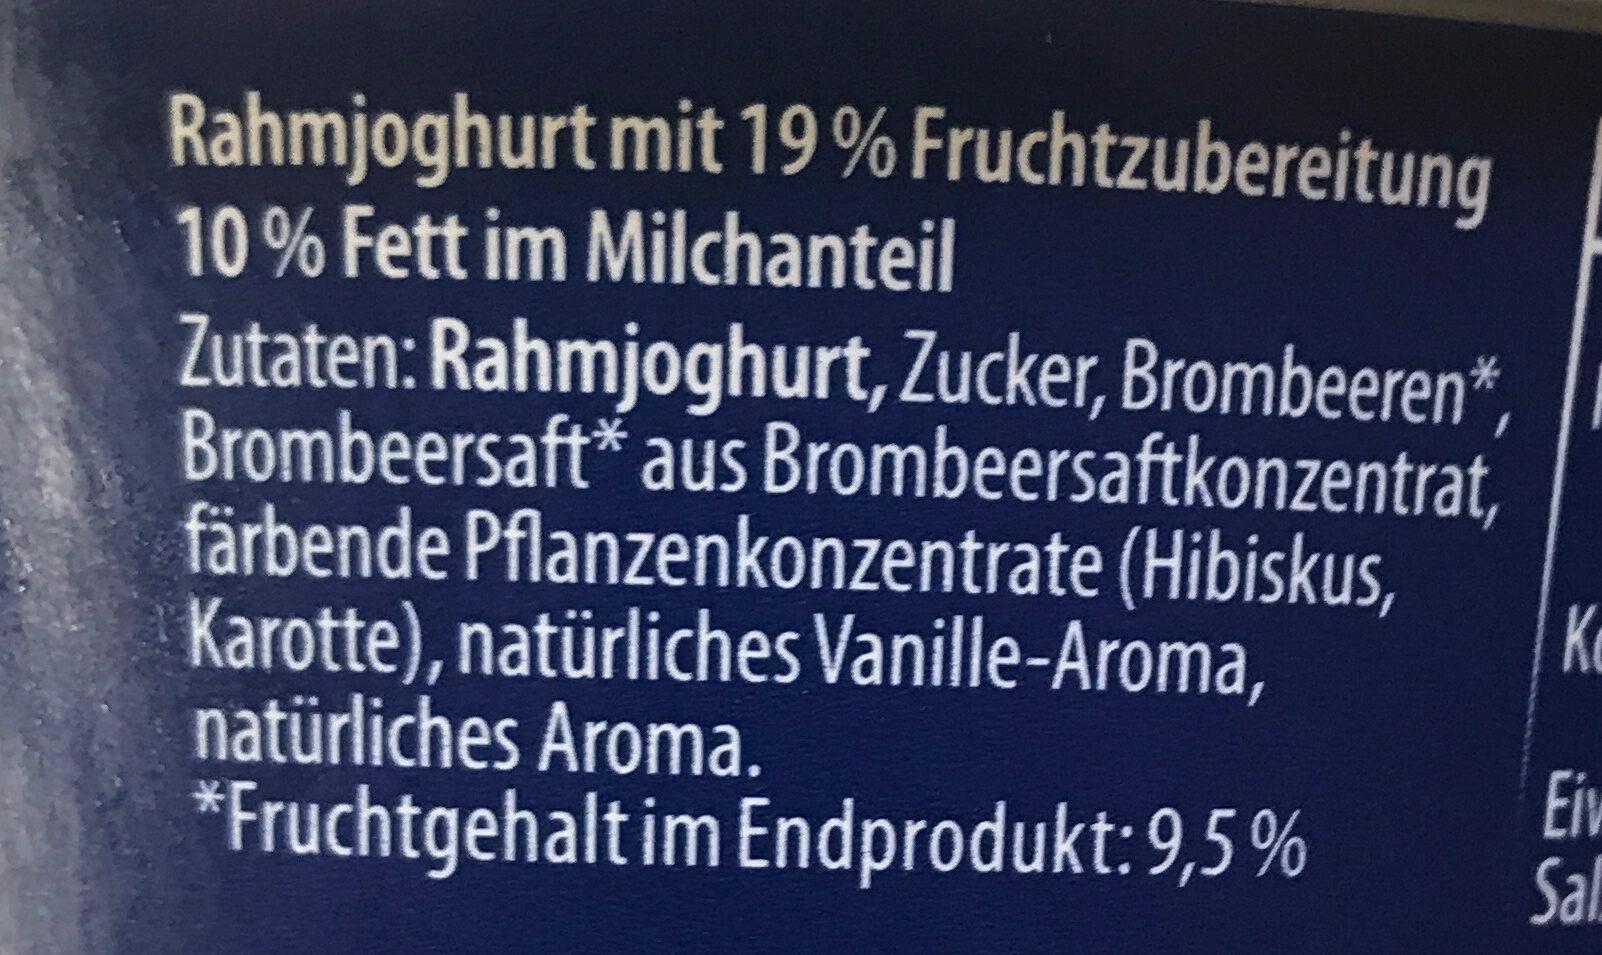 Rahmjoghurt Typ Brombeere-Bayerisch Creme - Ingredients - de